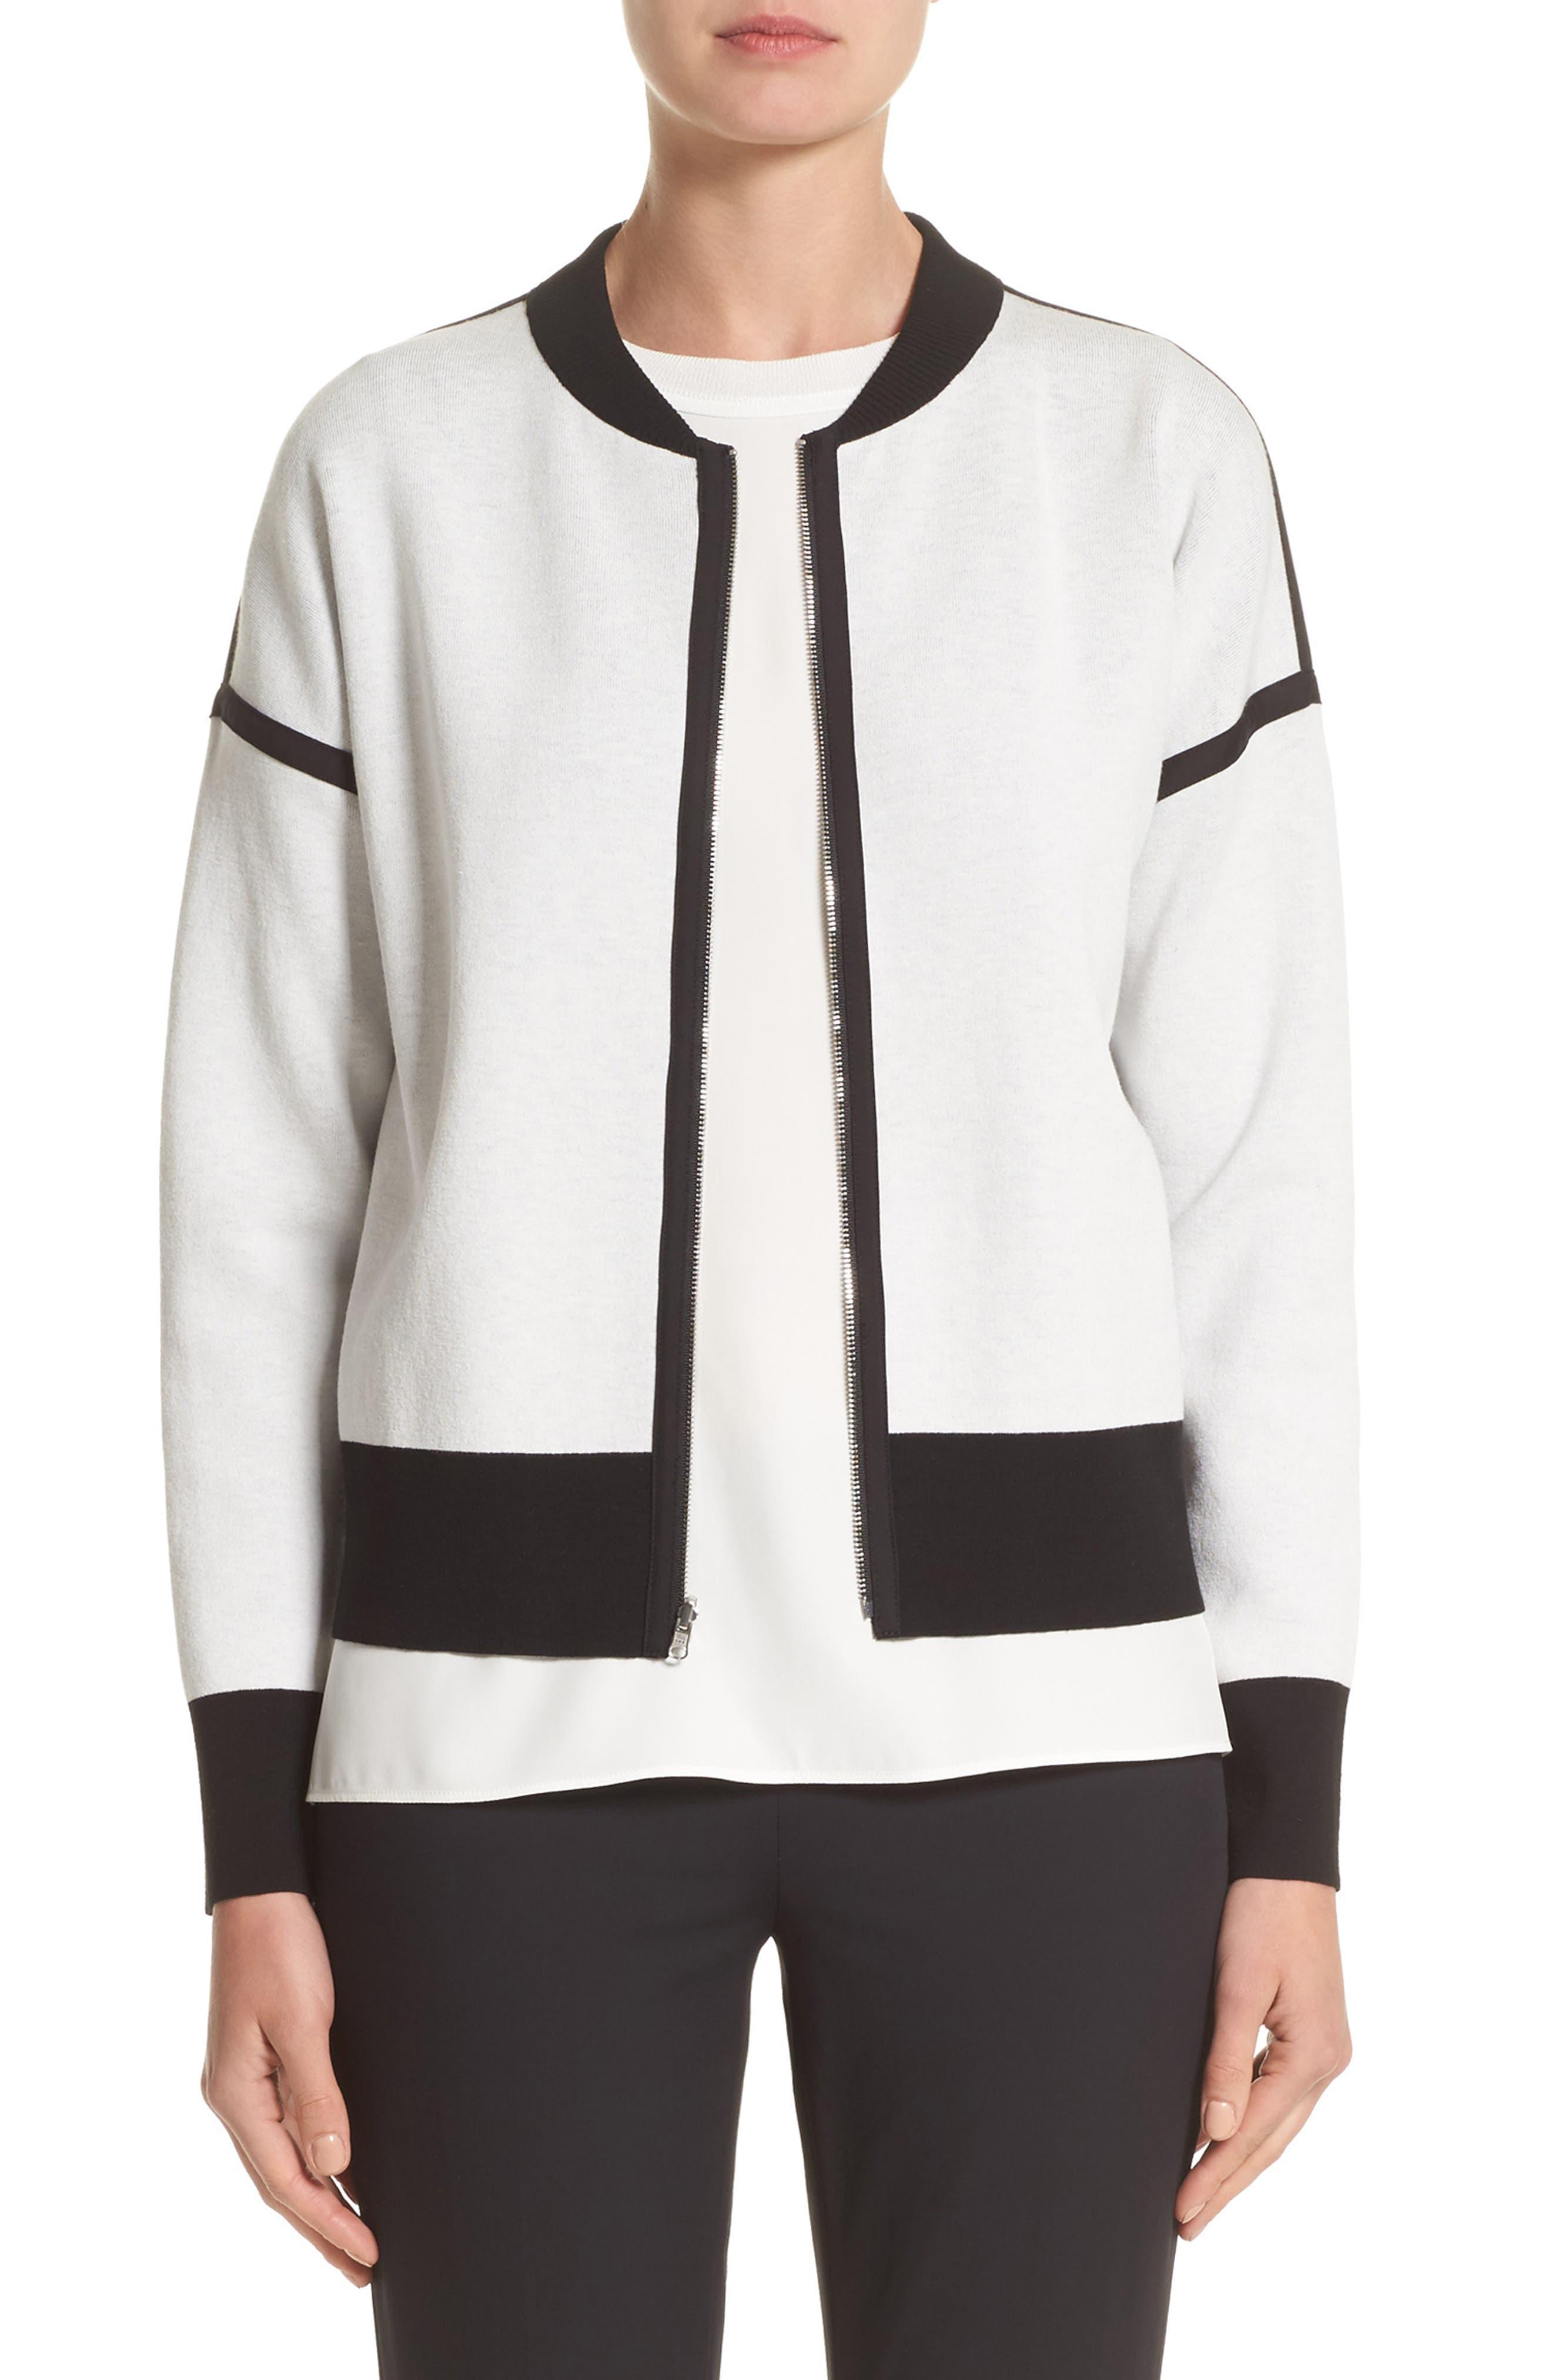 Matte Crepe Reversible Knit Bomber Jacket,                             Main thumbnail 1, color,                             Cloud / Black